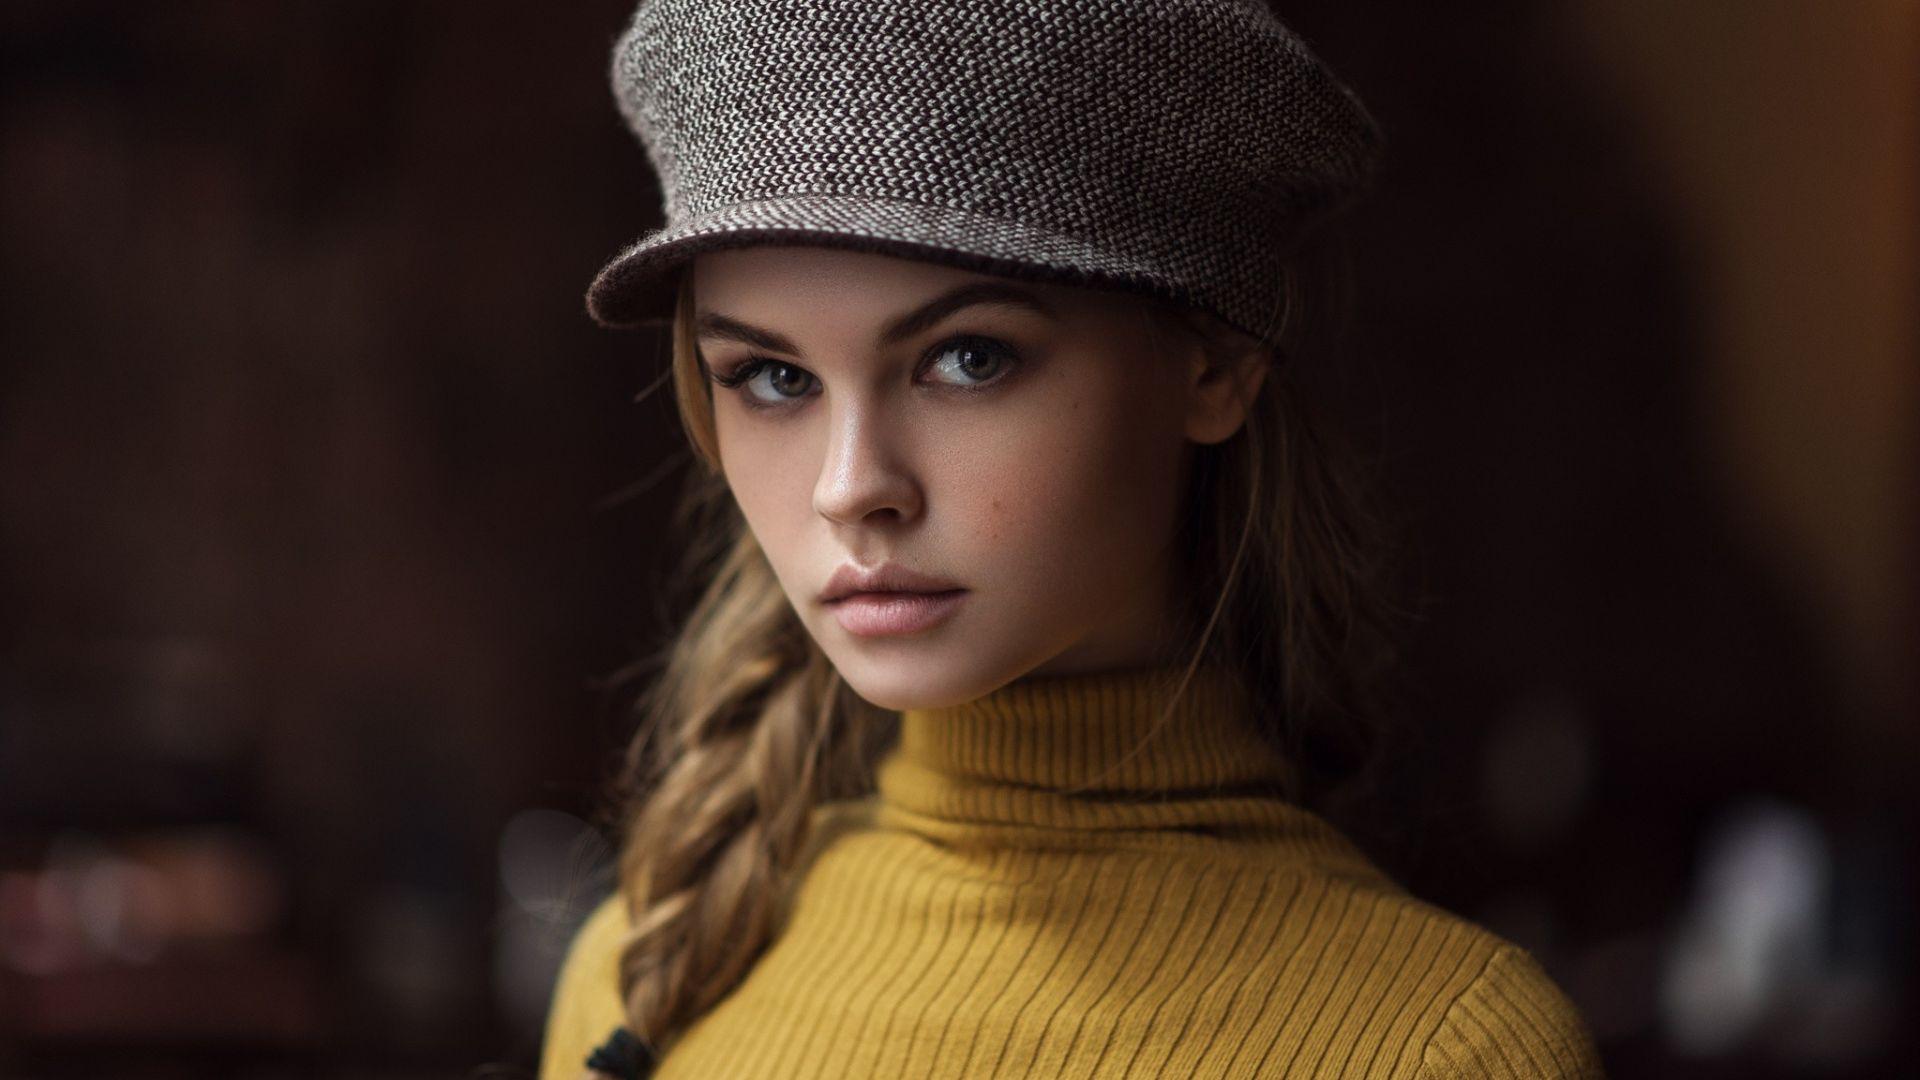 Wallpaper Anastasia Shcheglova, girl model, cap